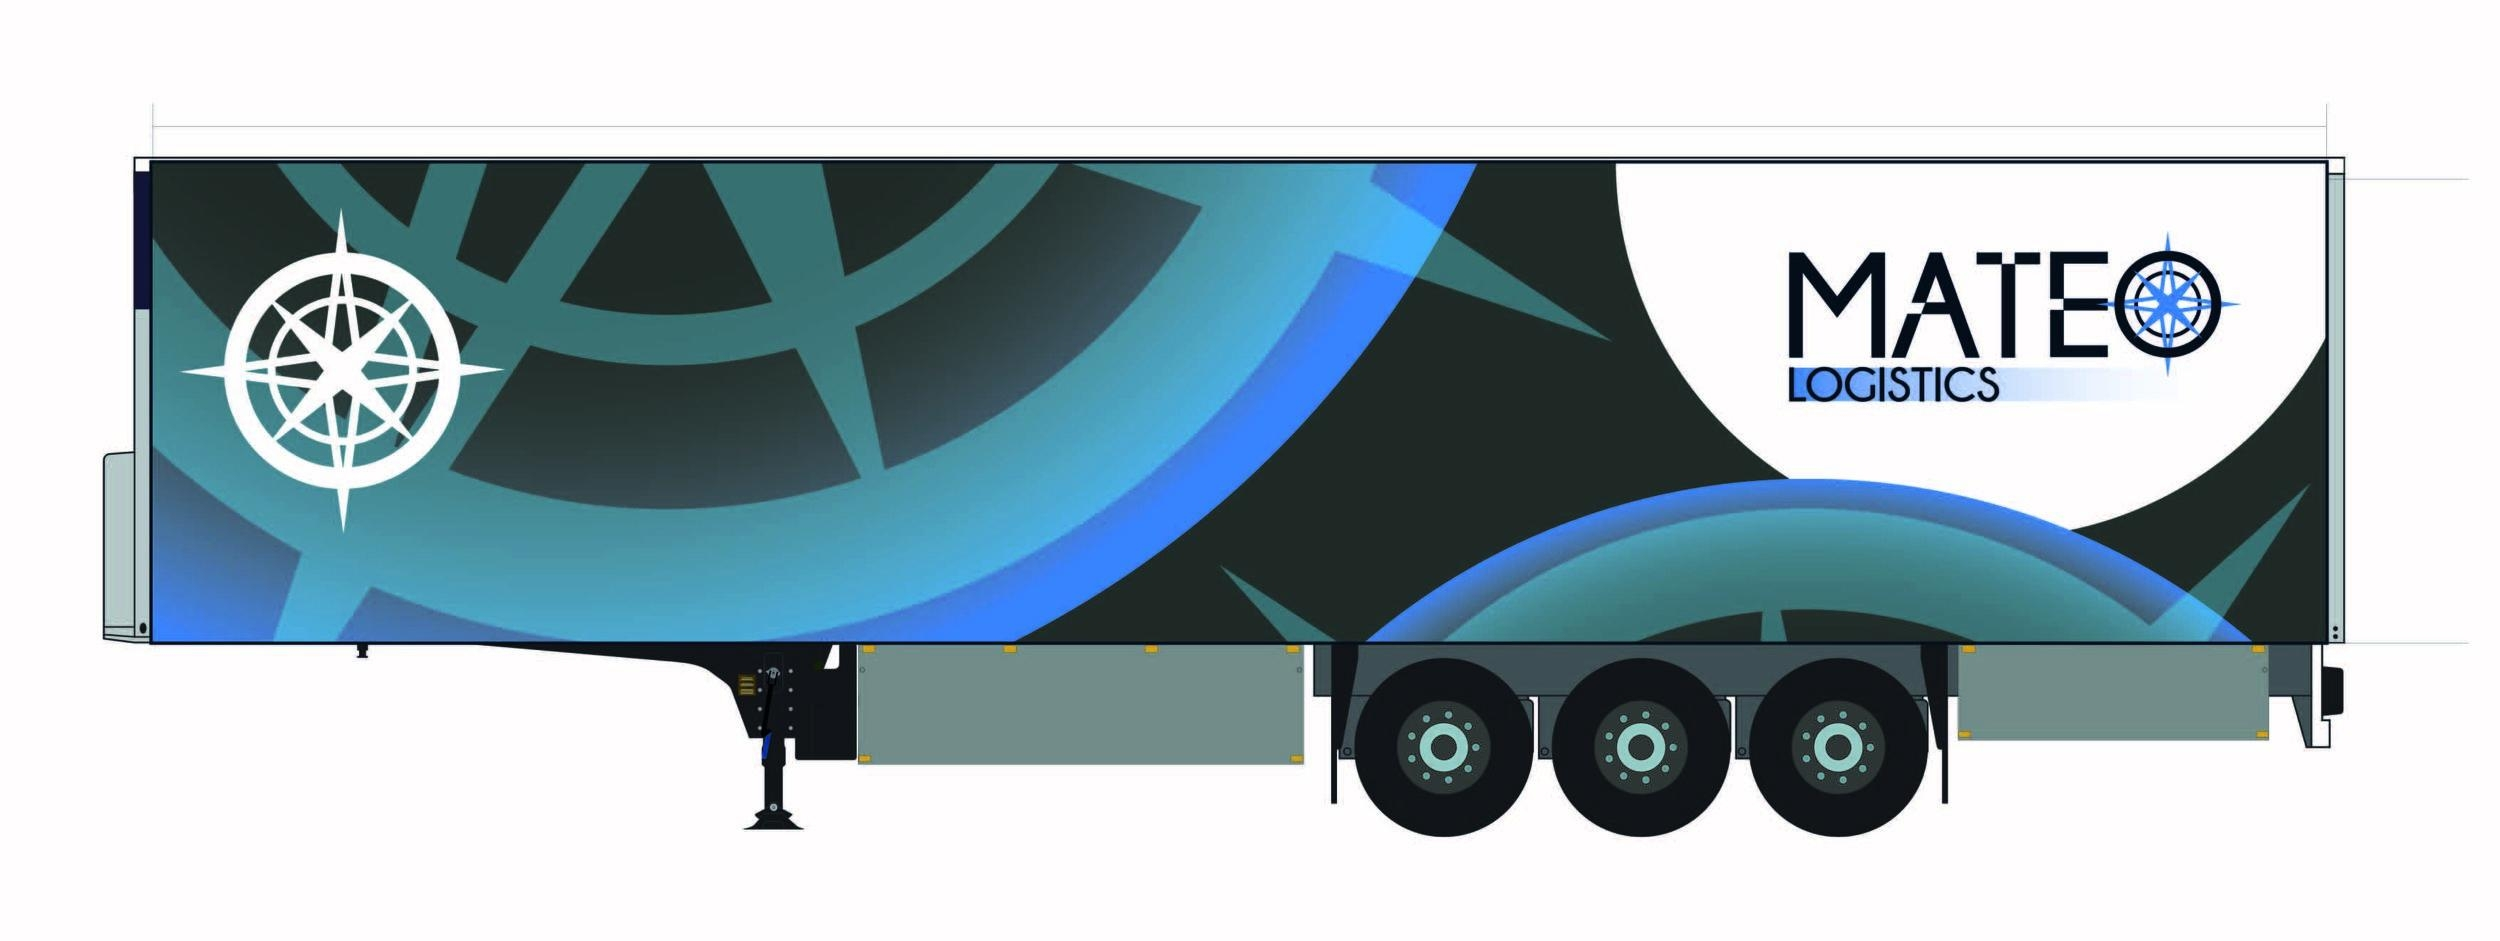 camion_visuel-01.jpg